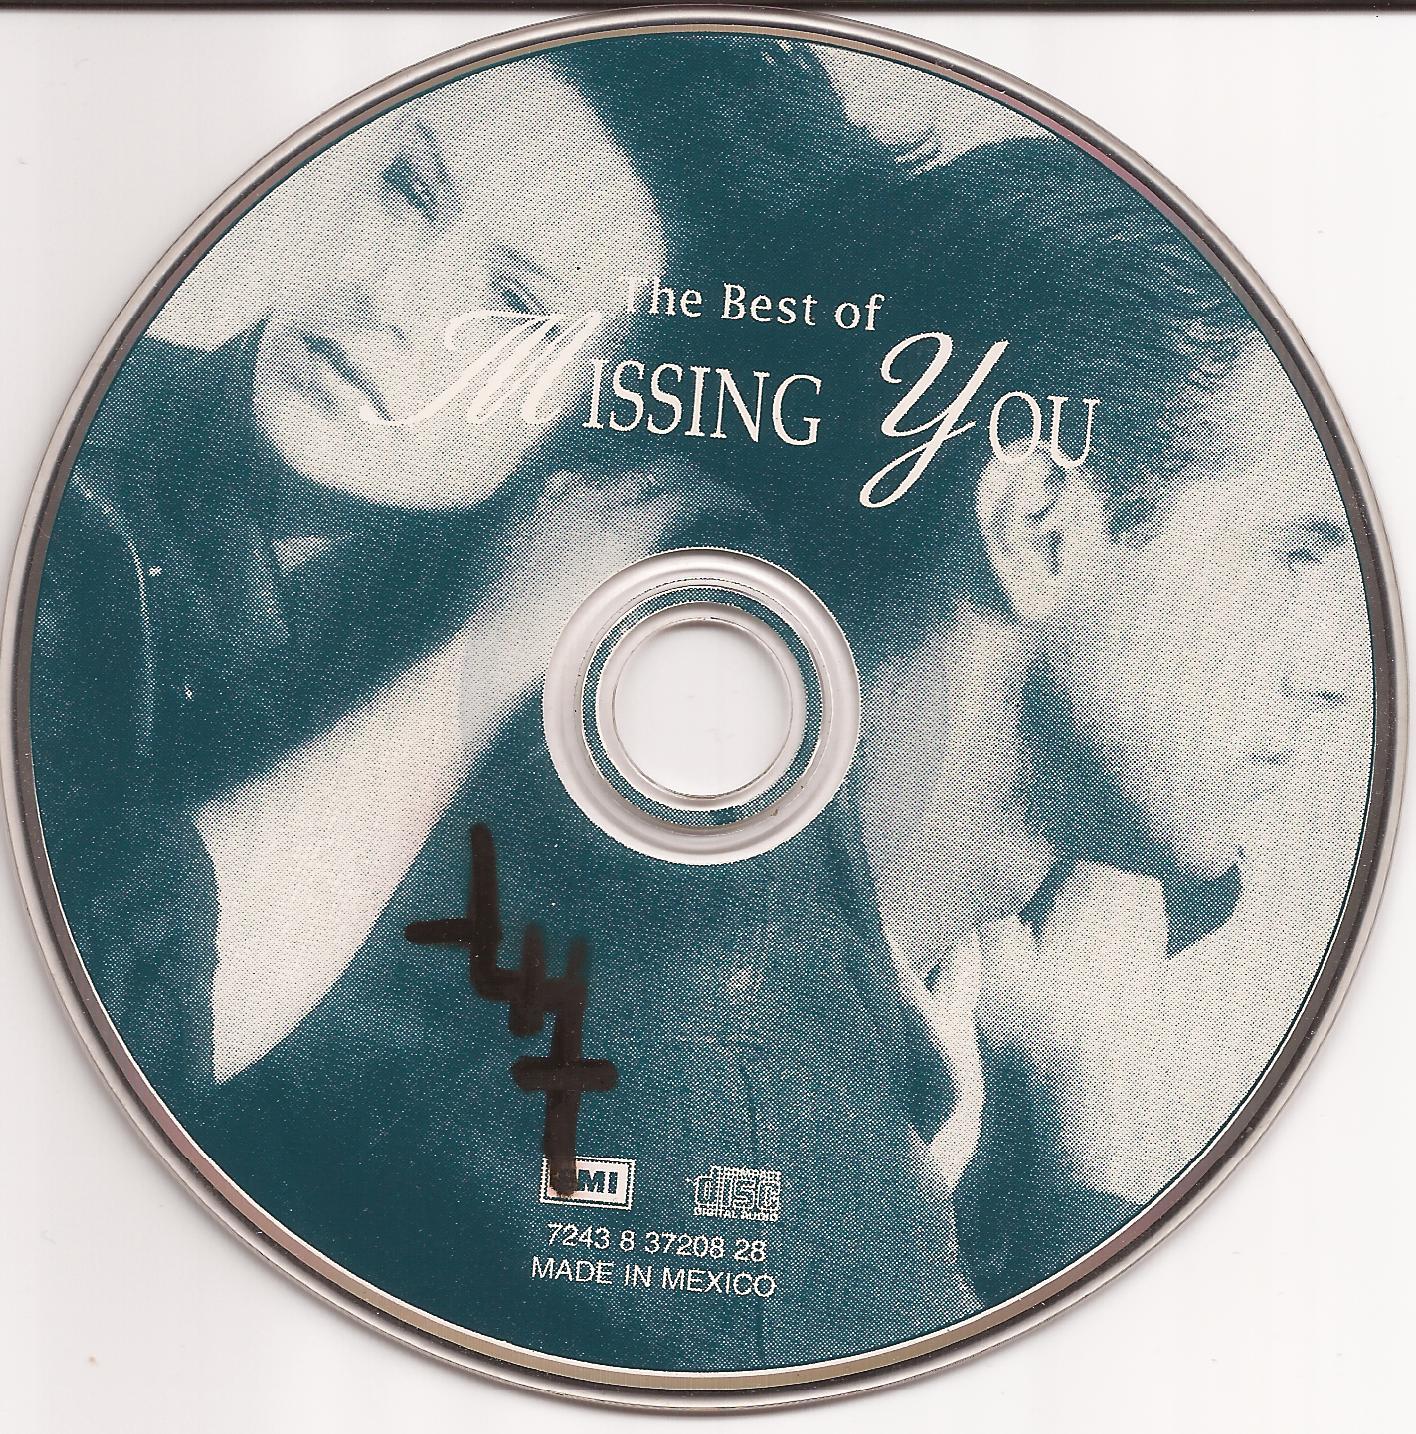 http://3.bp.blogspot.com/-yQLT5tEYO3Q/T3kMeaQ4W8I/AAAAAAAACQo/5GfUFJd-Wm0/s1600/Best+Of+Missing+You+cd.jpg